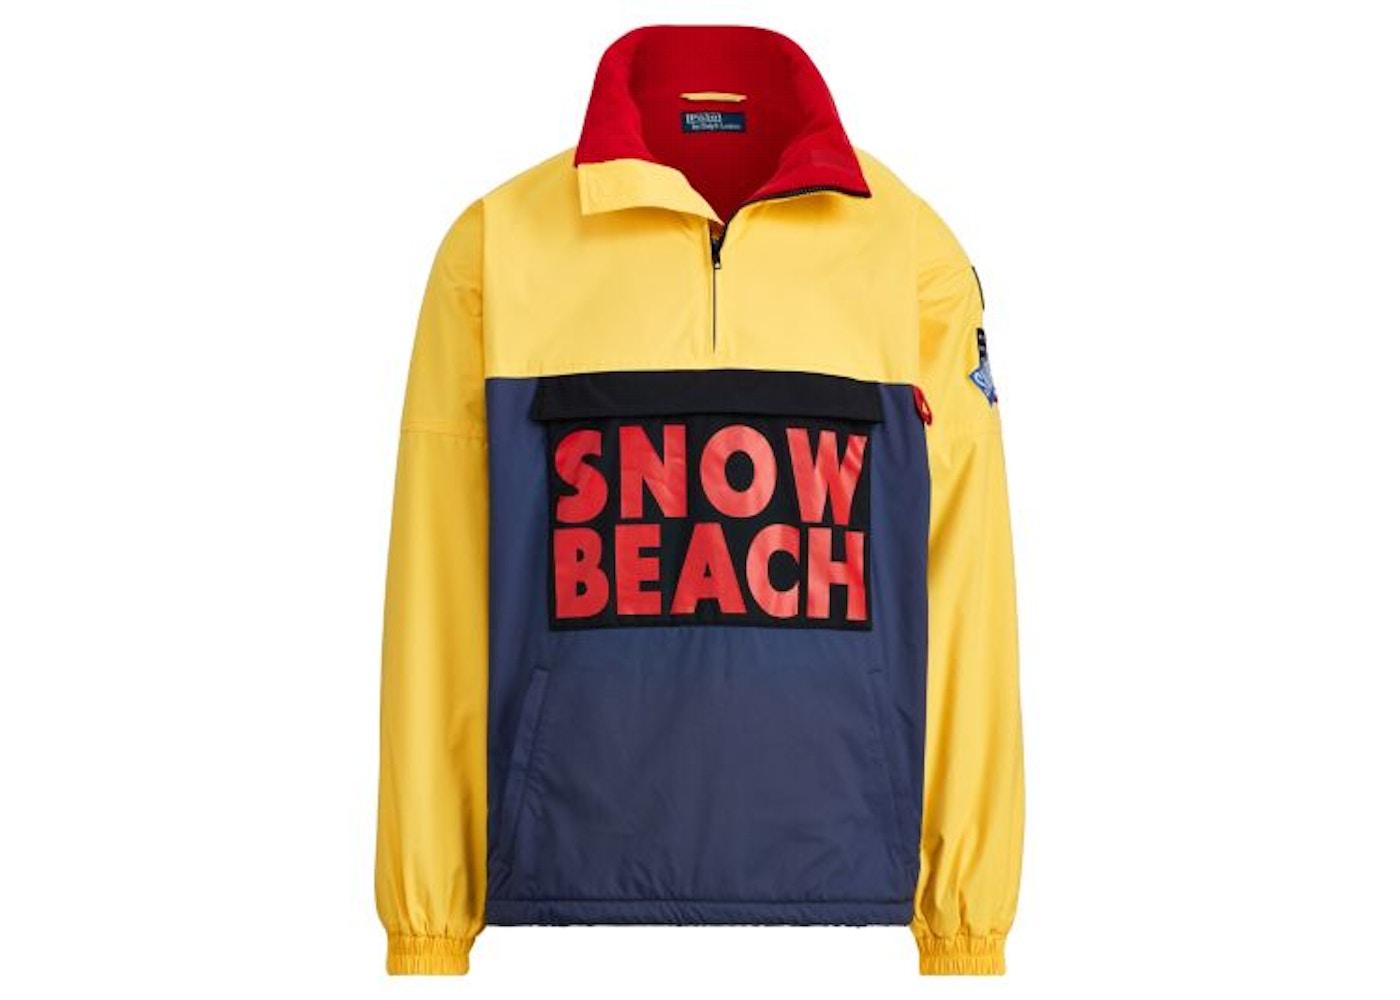 f7f8ffae3462 Polo Ralph Lauren Snow Beach Pullover Deep Water Chrome Yellow - FW17